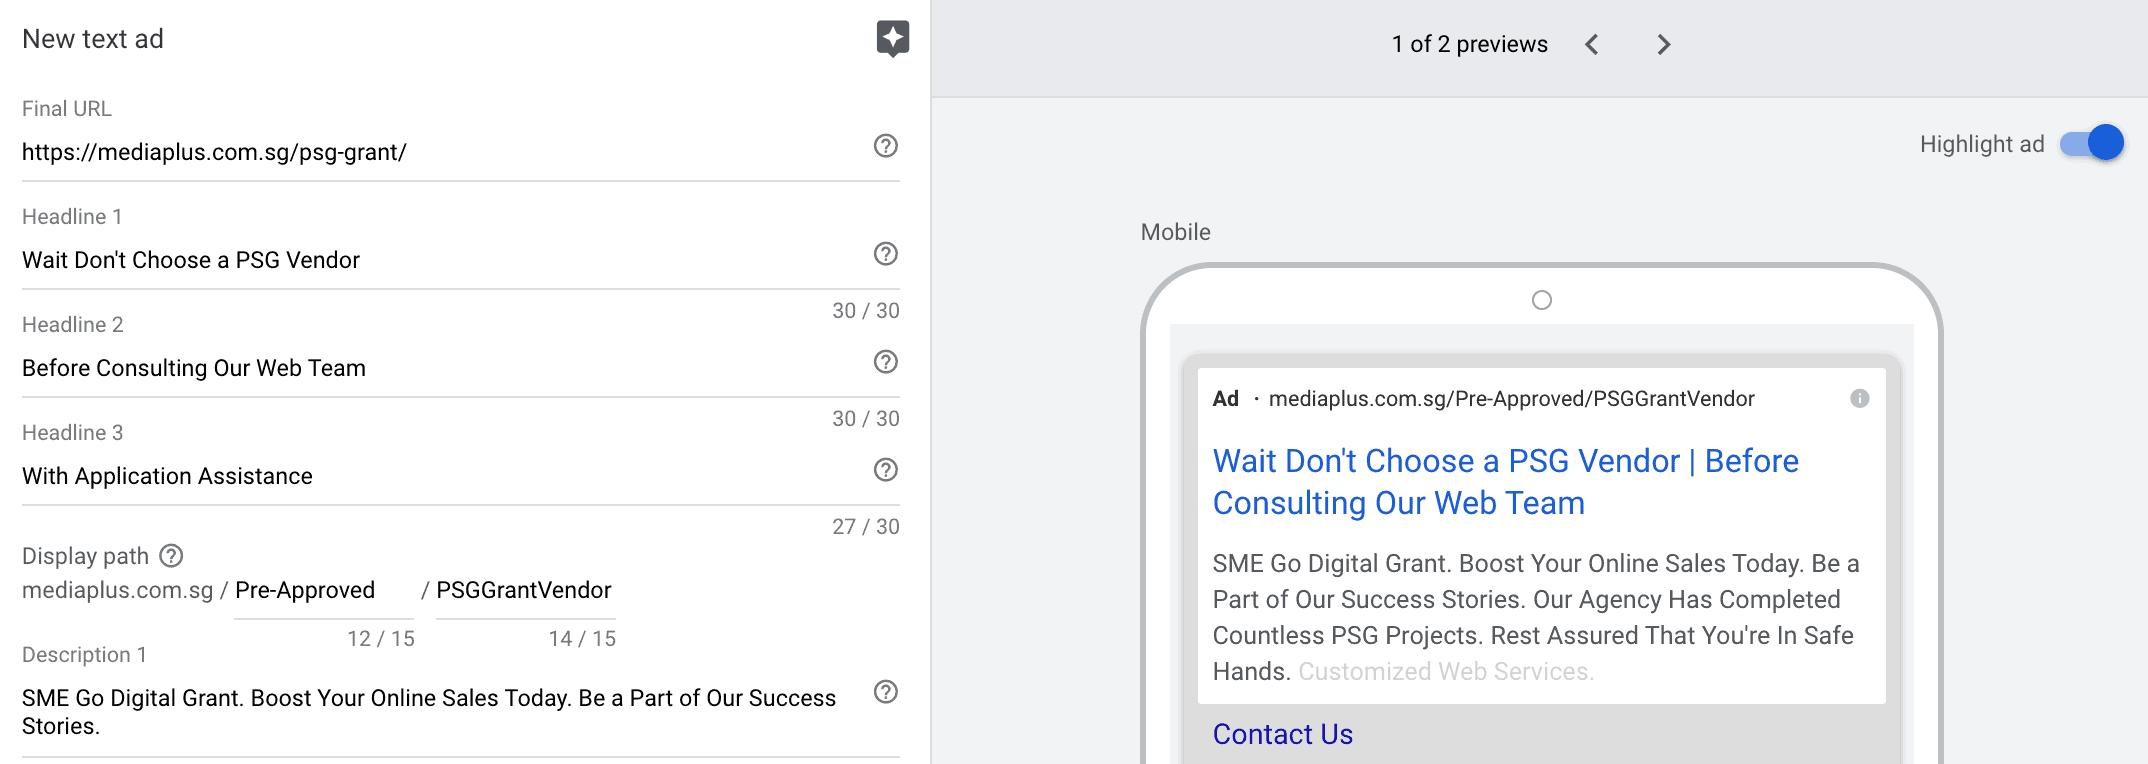 Google search ads creation